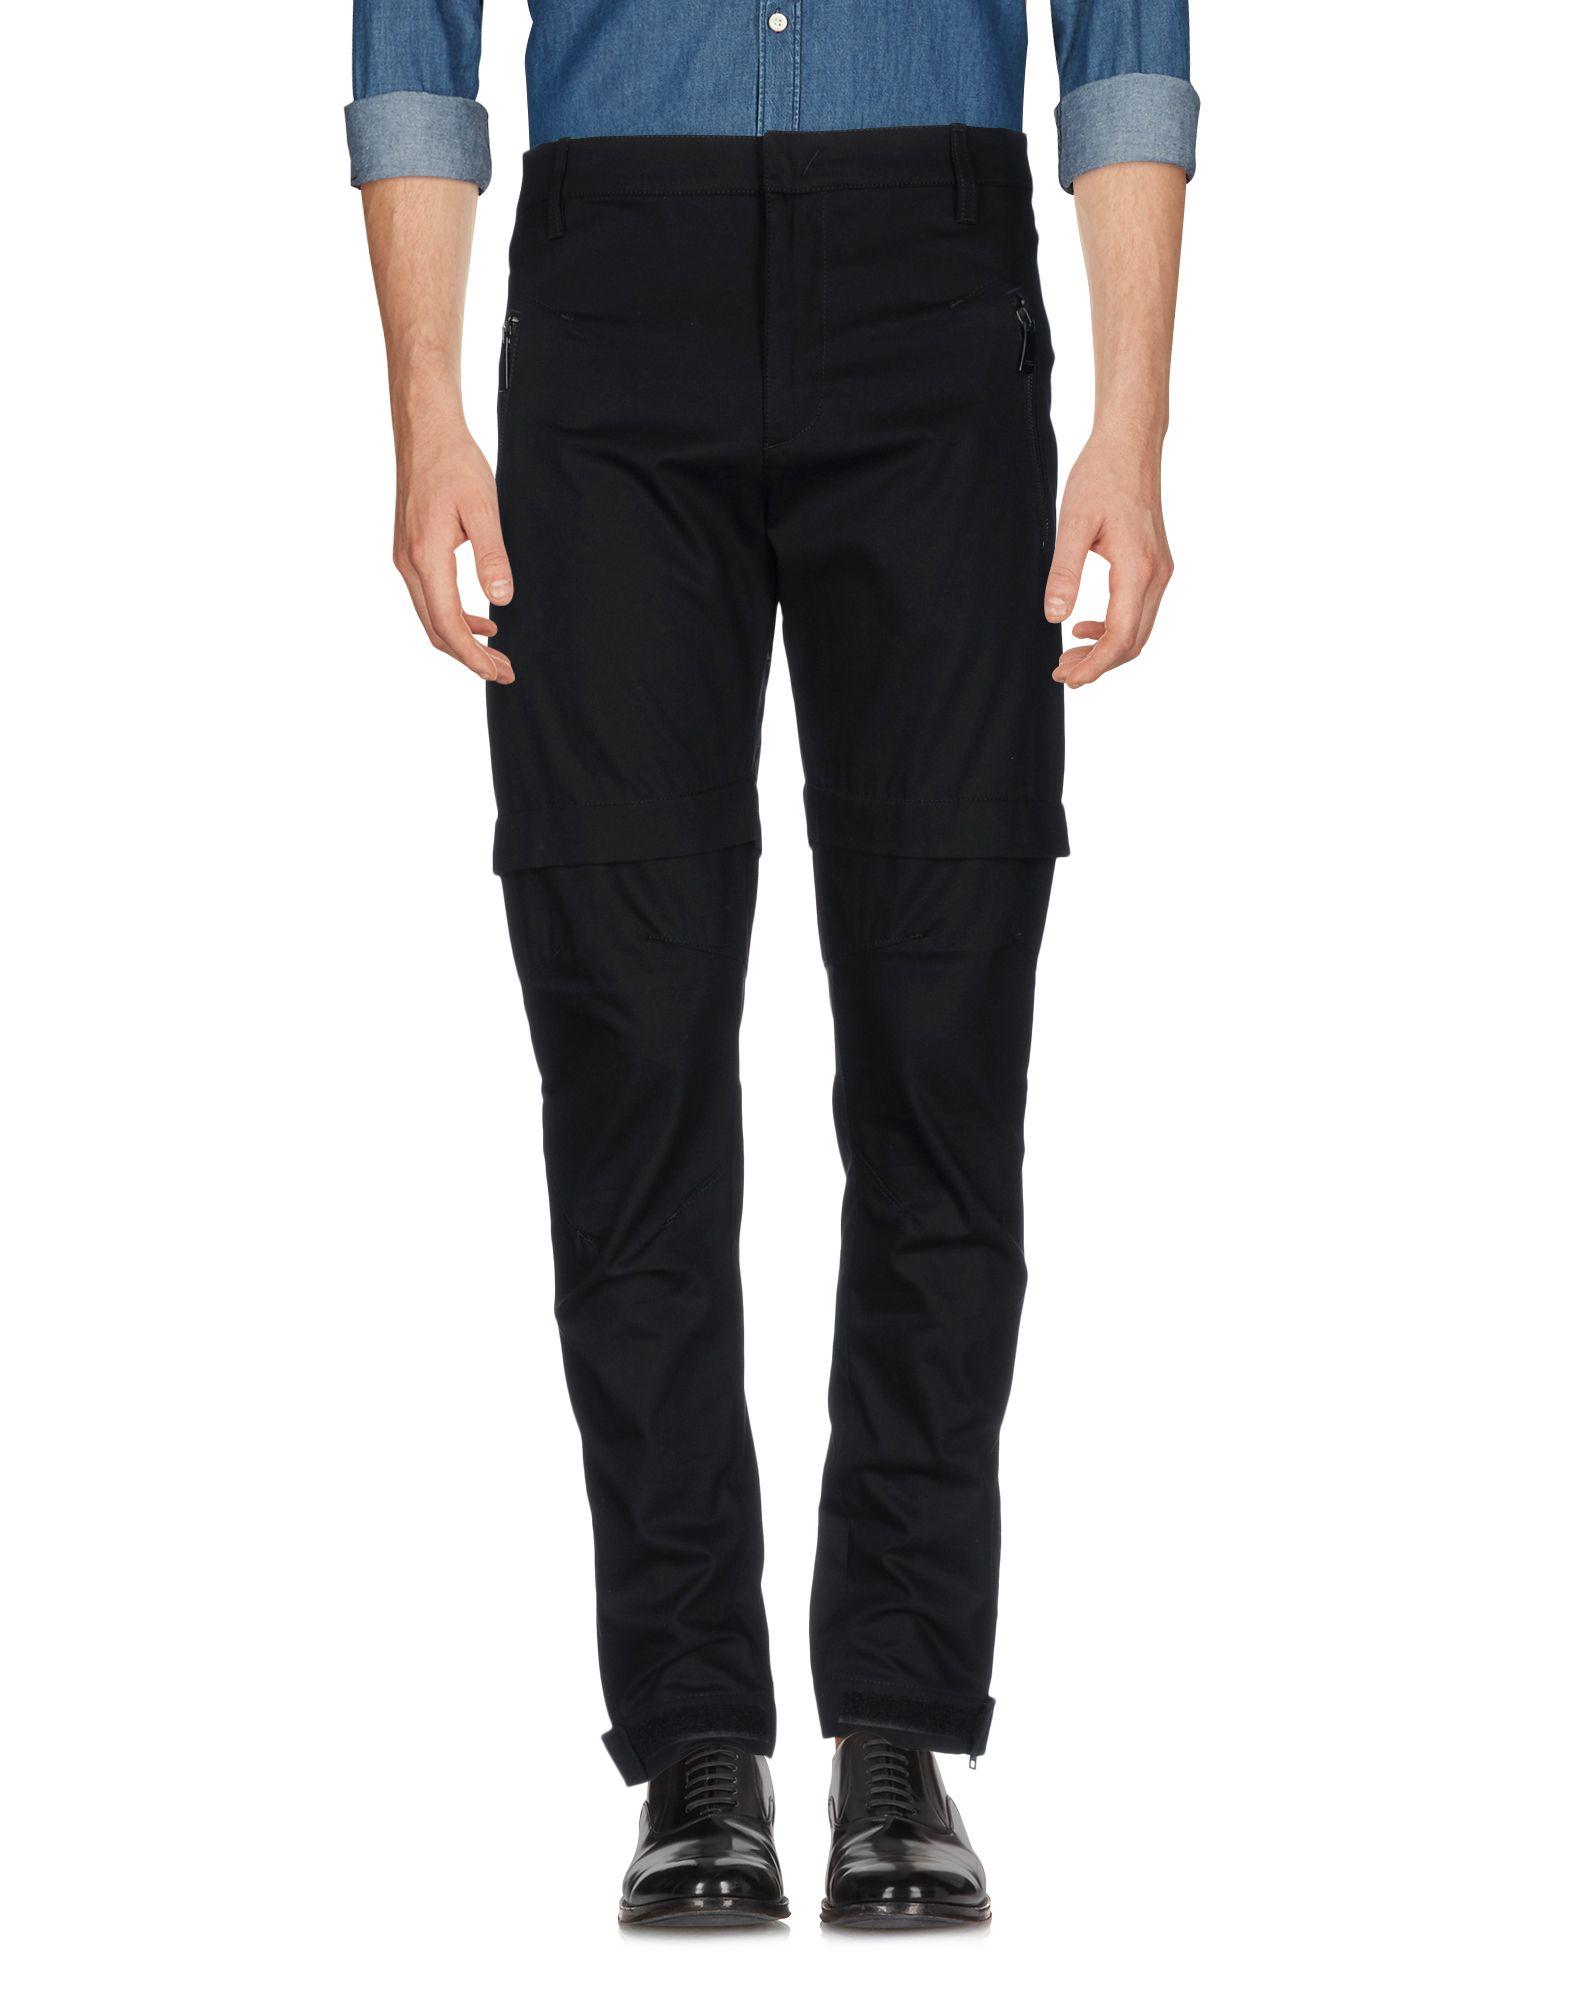 Pantalone Marcelo Burlon Uomo - Acquista online su